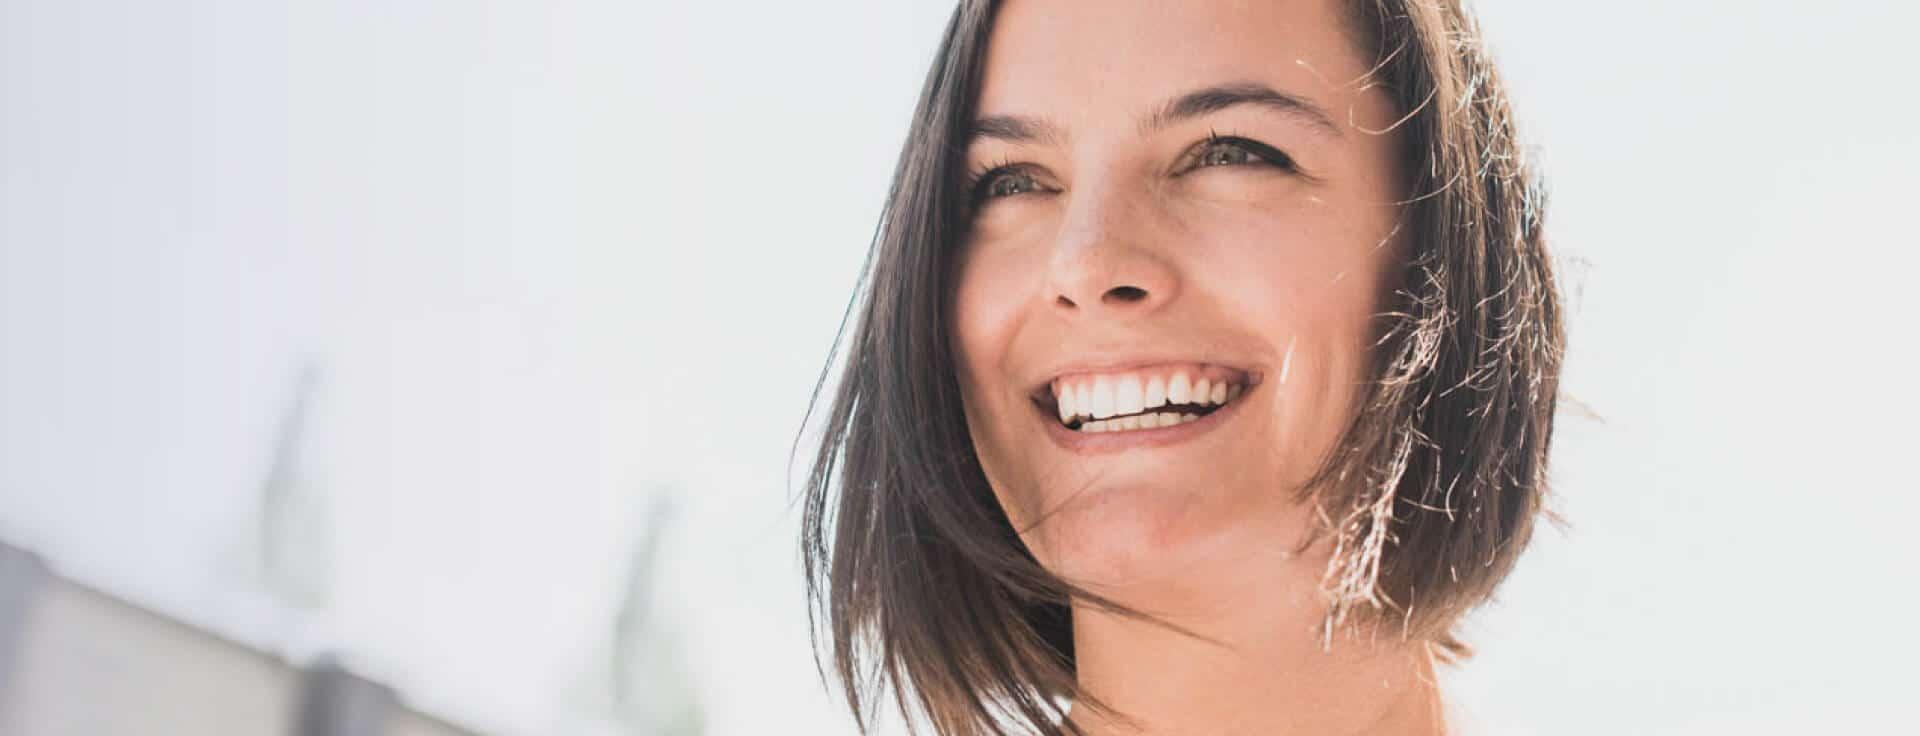 Smiling Face from Novo Dental Centre - Abbotsford Dentist